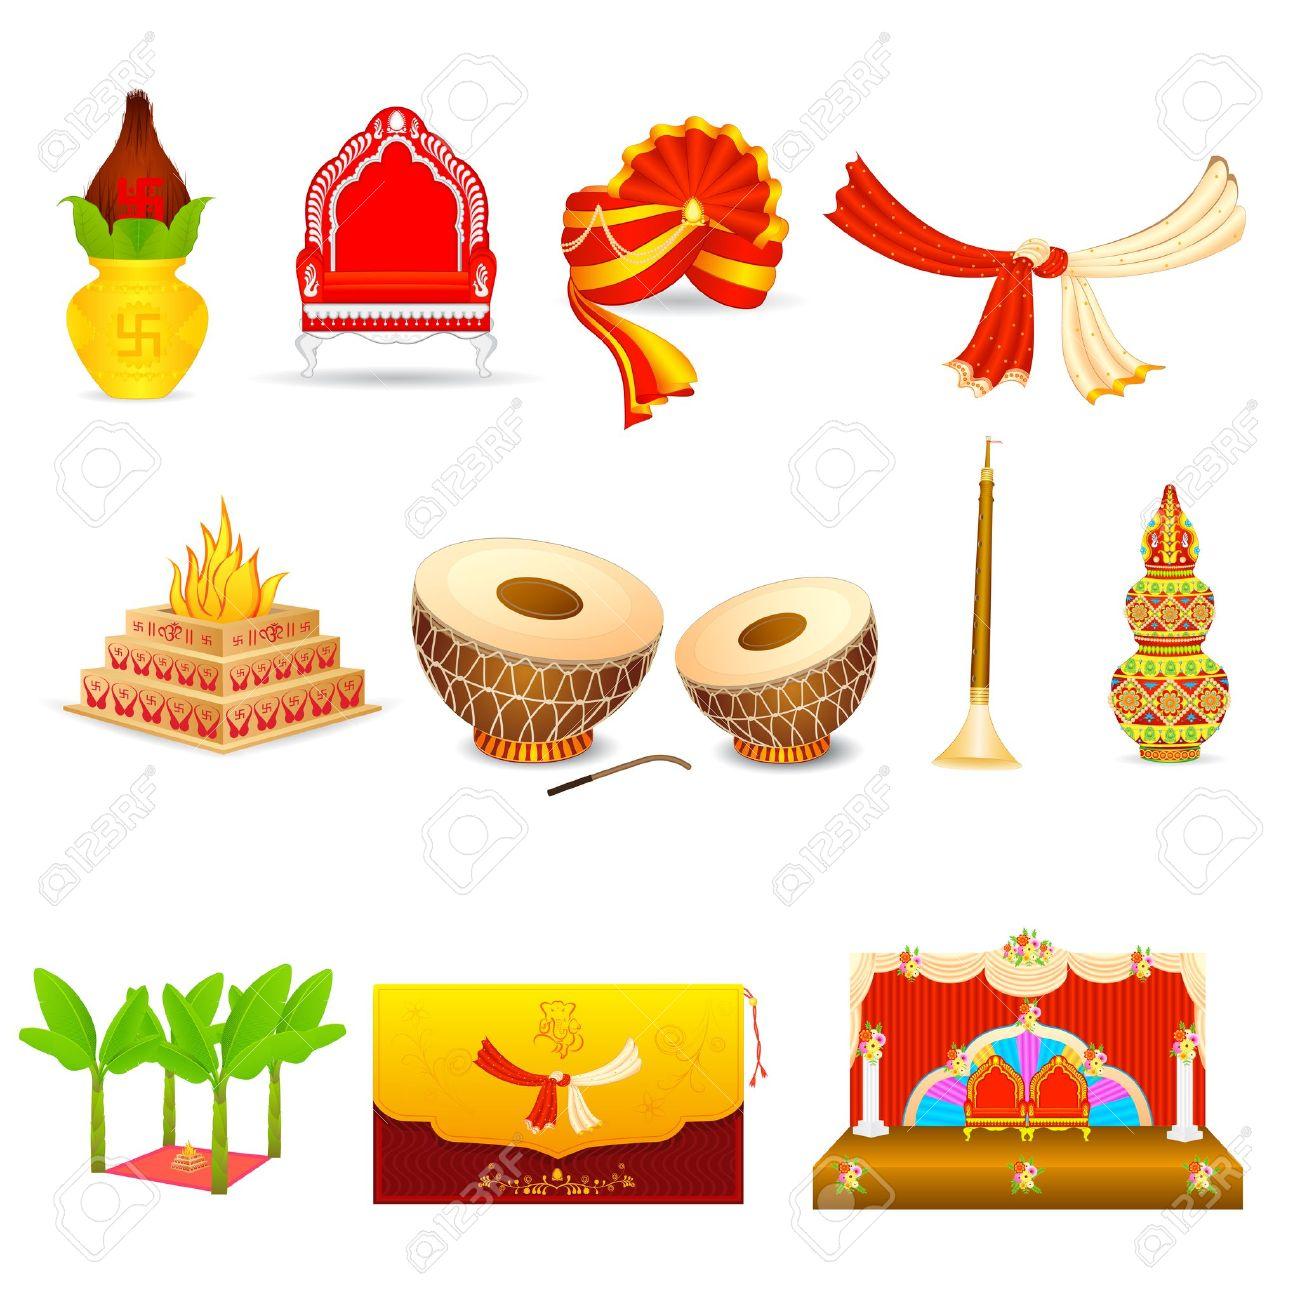 Indian Wedding PNG Vector - 56570